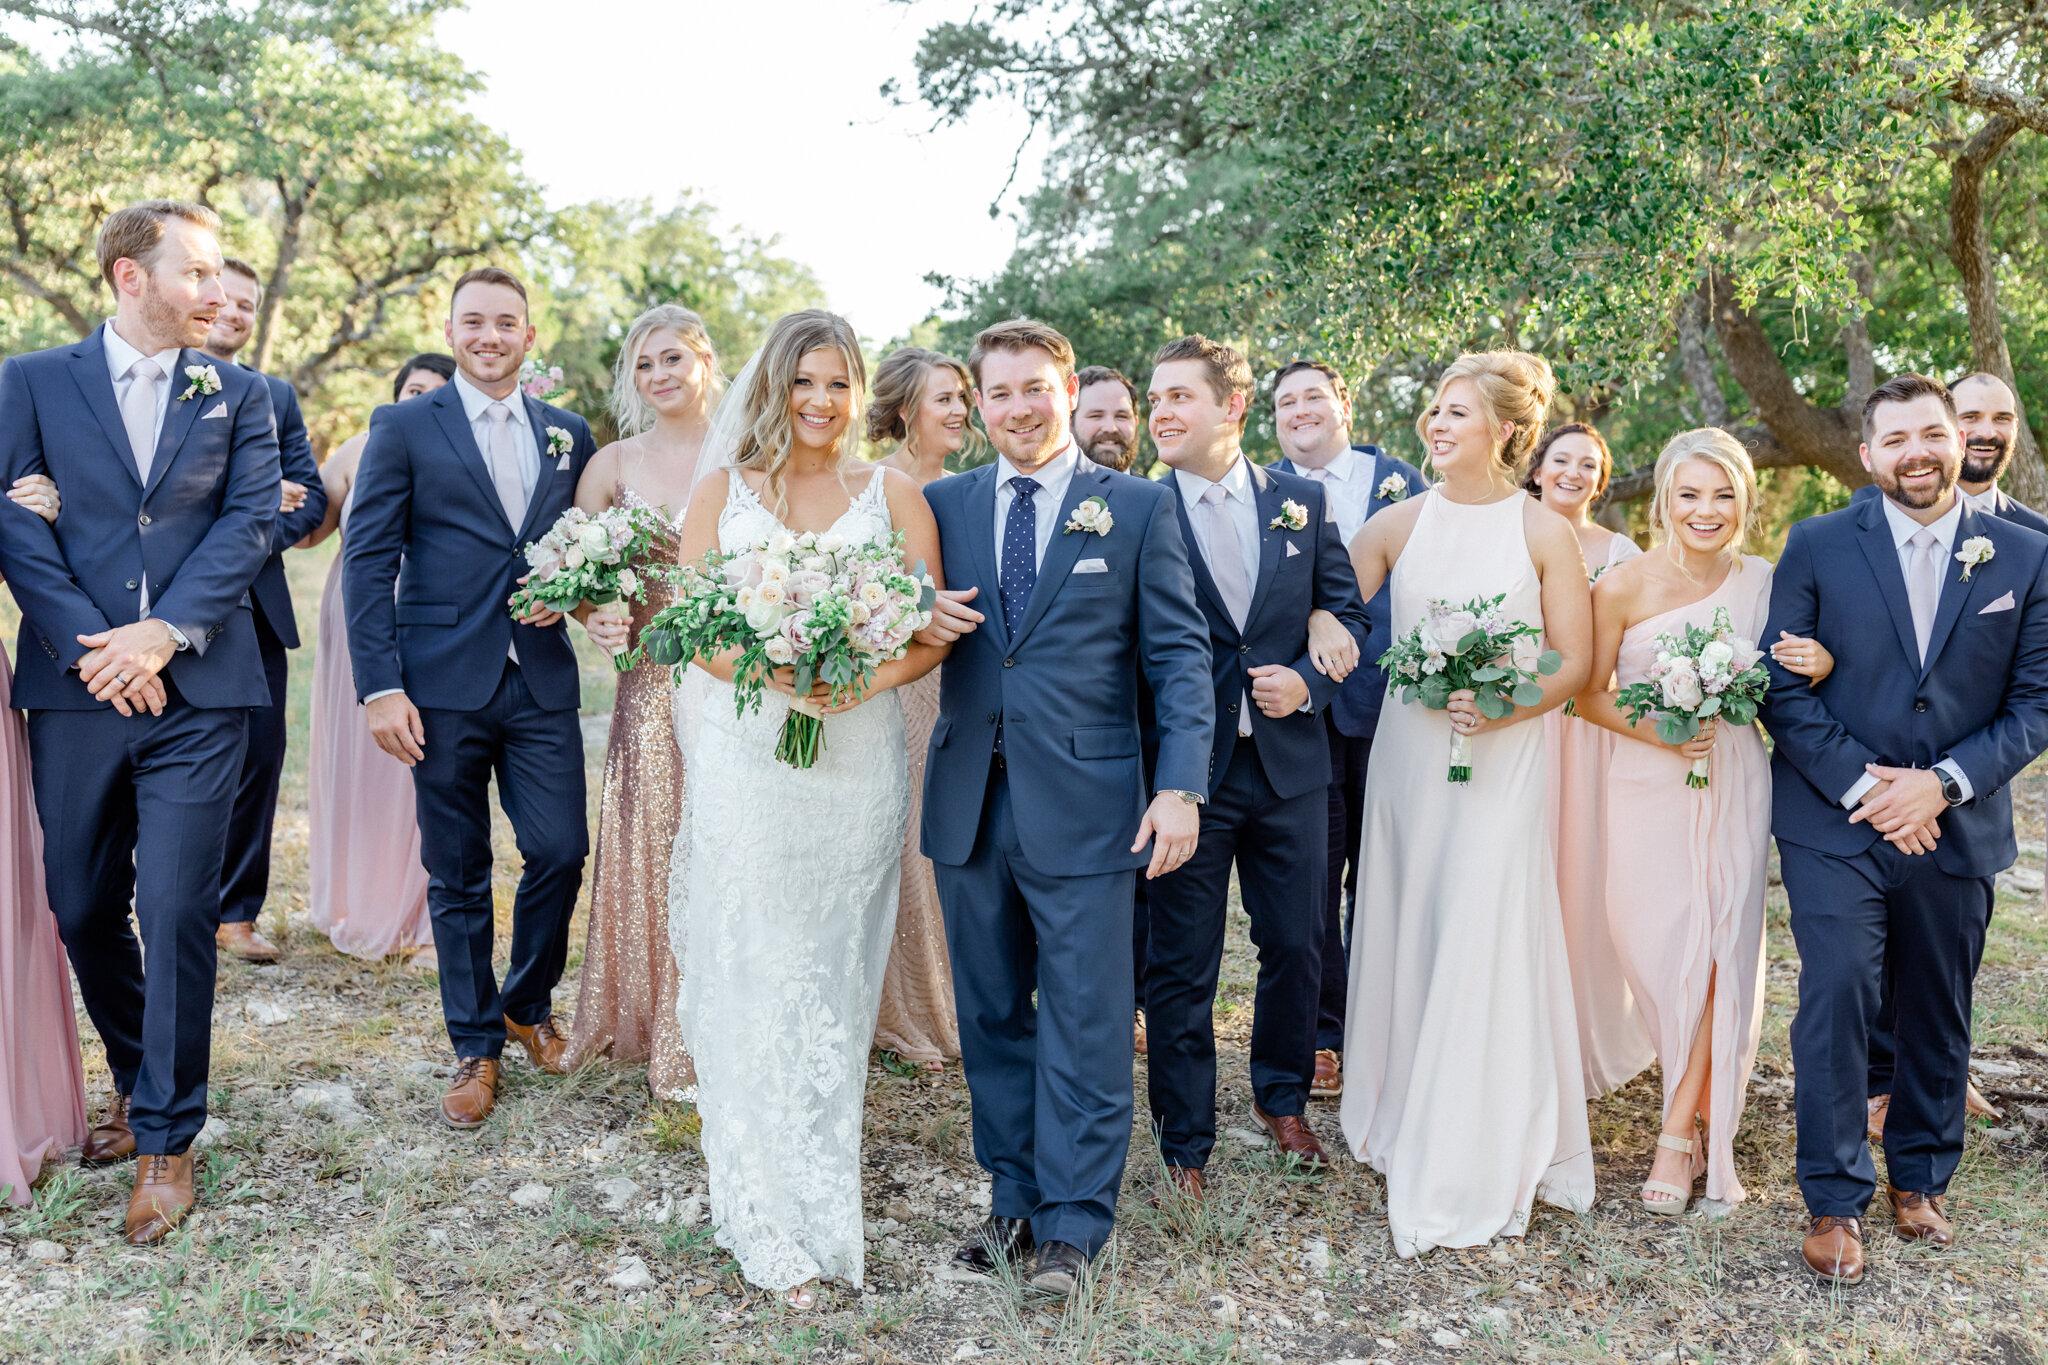 San Antonio Austin Boerne New Braunfels Spring Branch Texas Wedding Engagement Photographer Photography Hill Country Texas Park 31 Wedding Summer Wedding Pink Navy Gold Elegant Chic Wedding San Antonio Austin Texas photographer 69